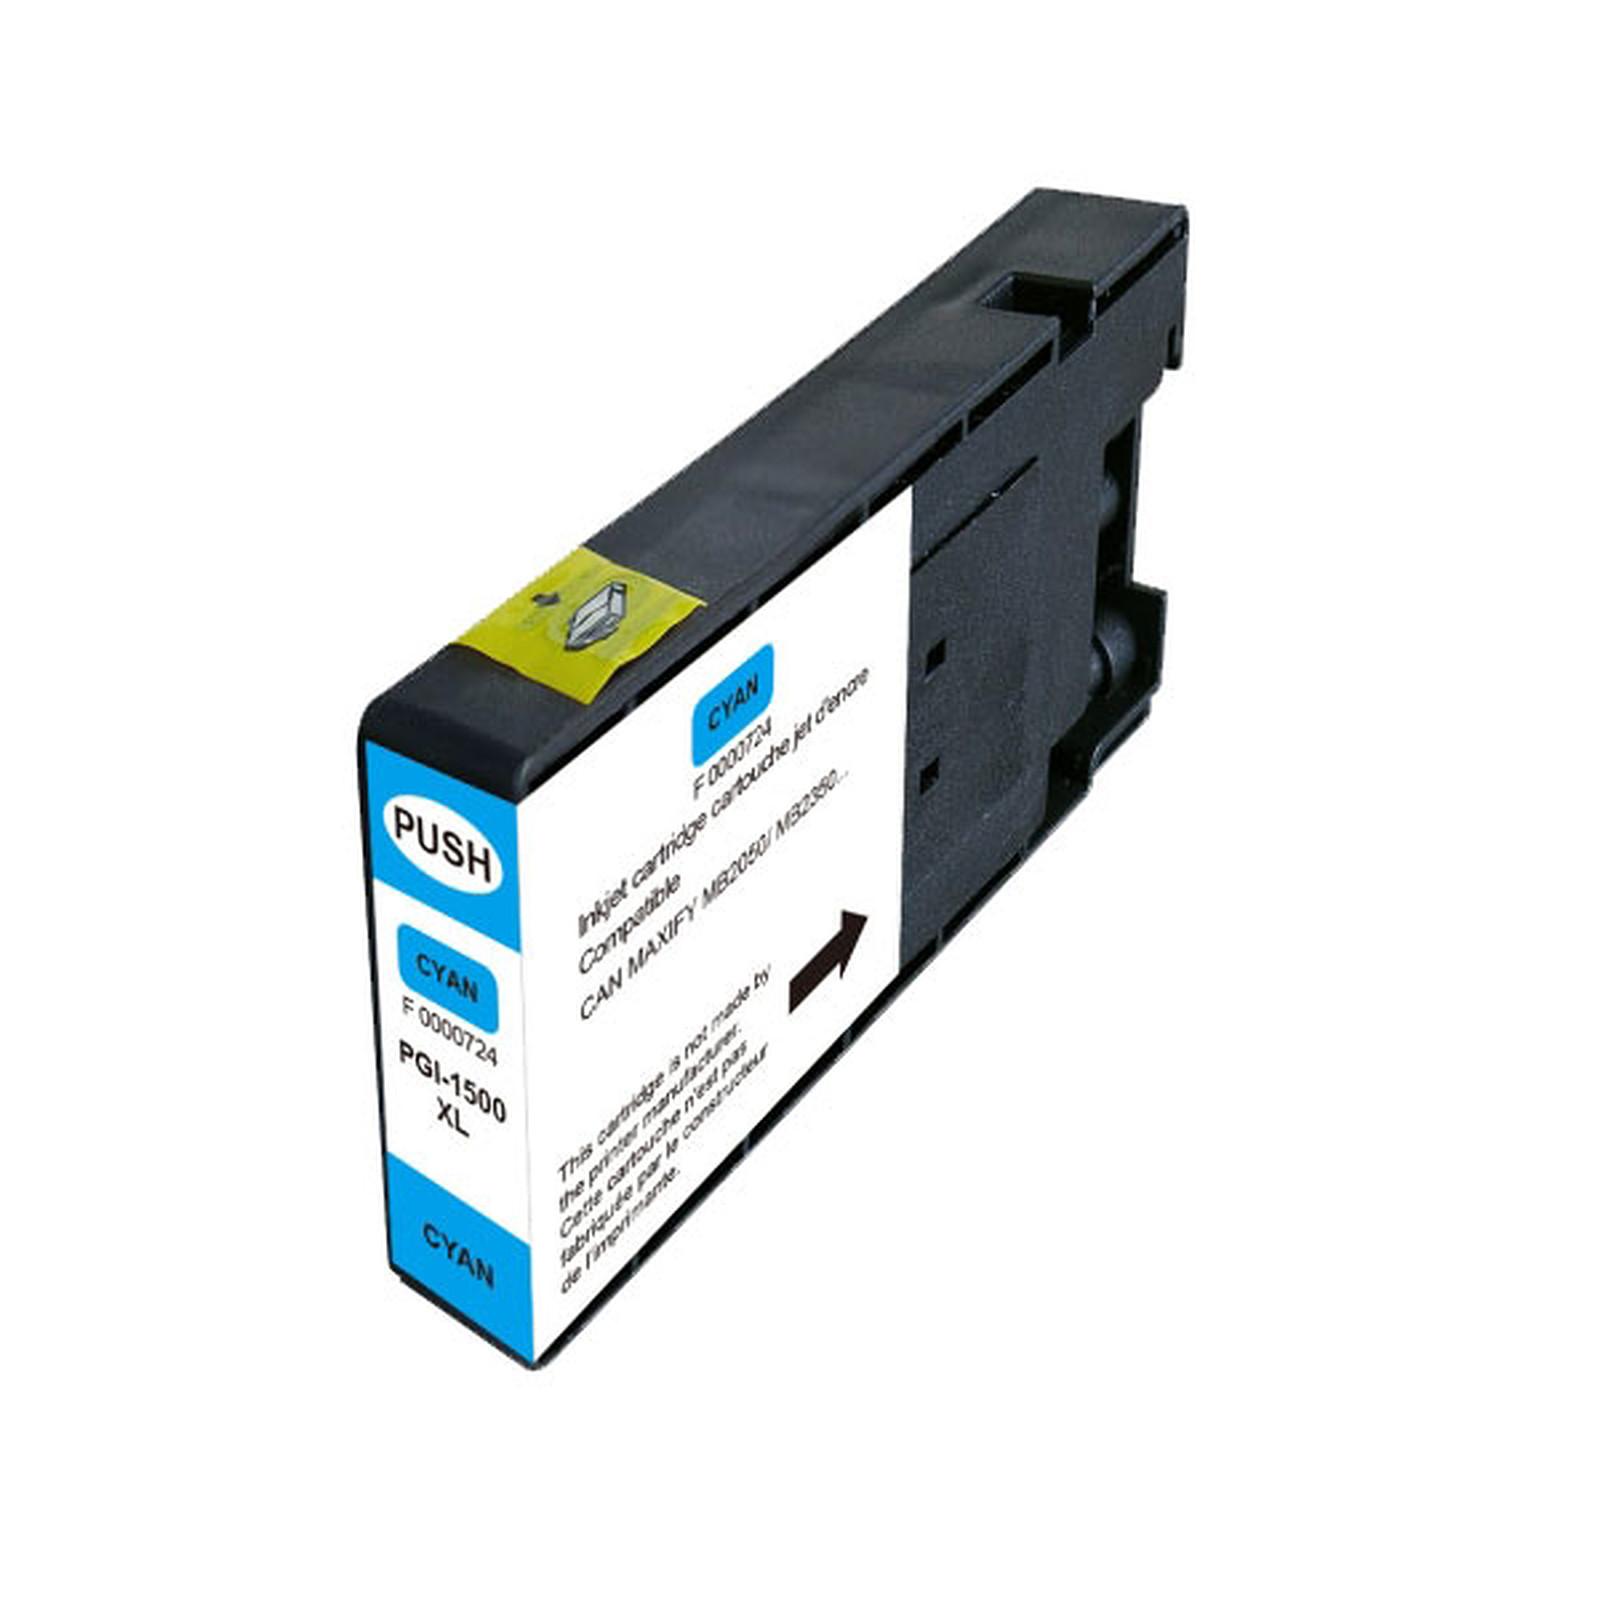 Cartouche compatible Canon PGI-1500XL C (Cyan)